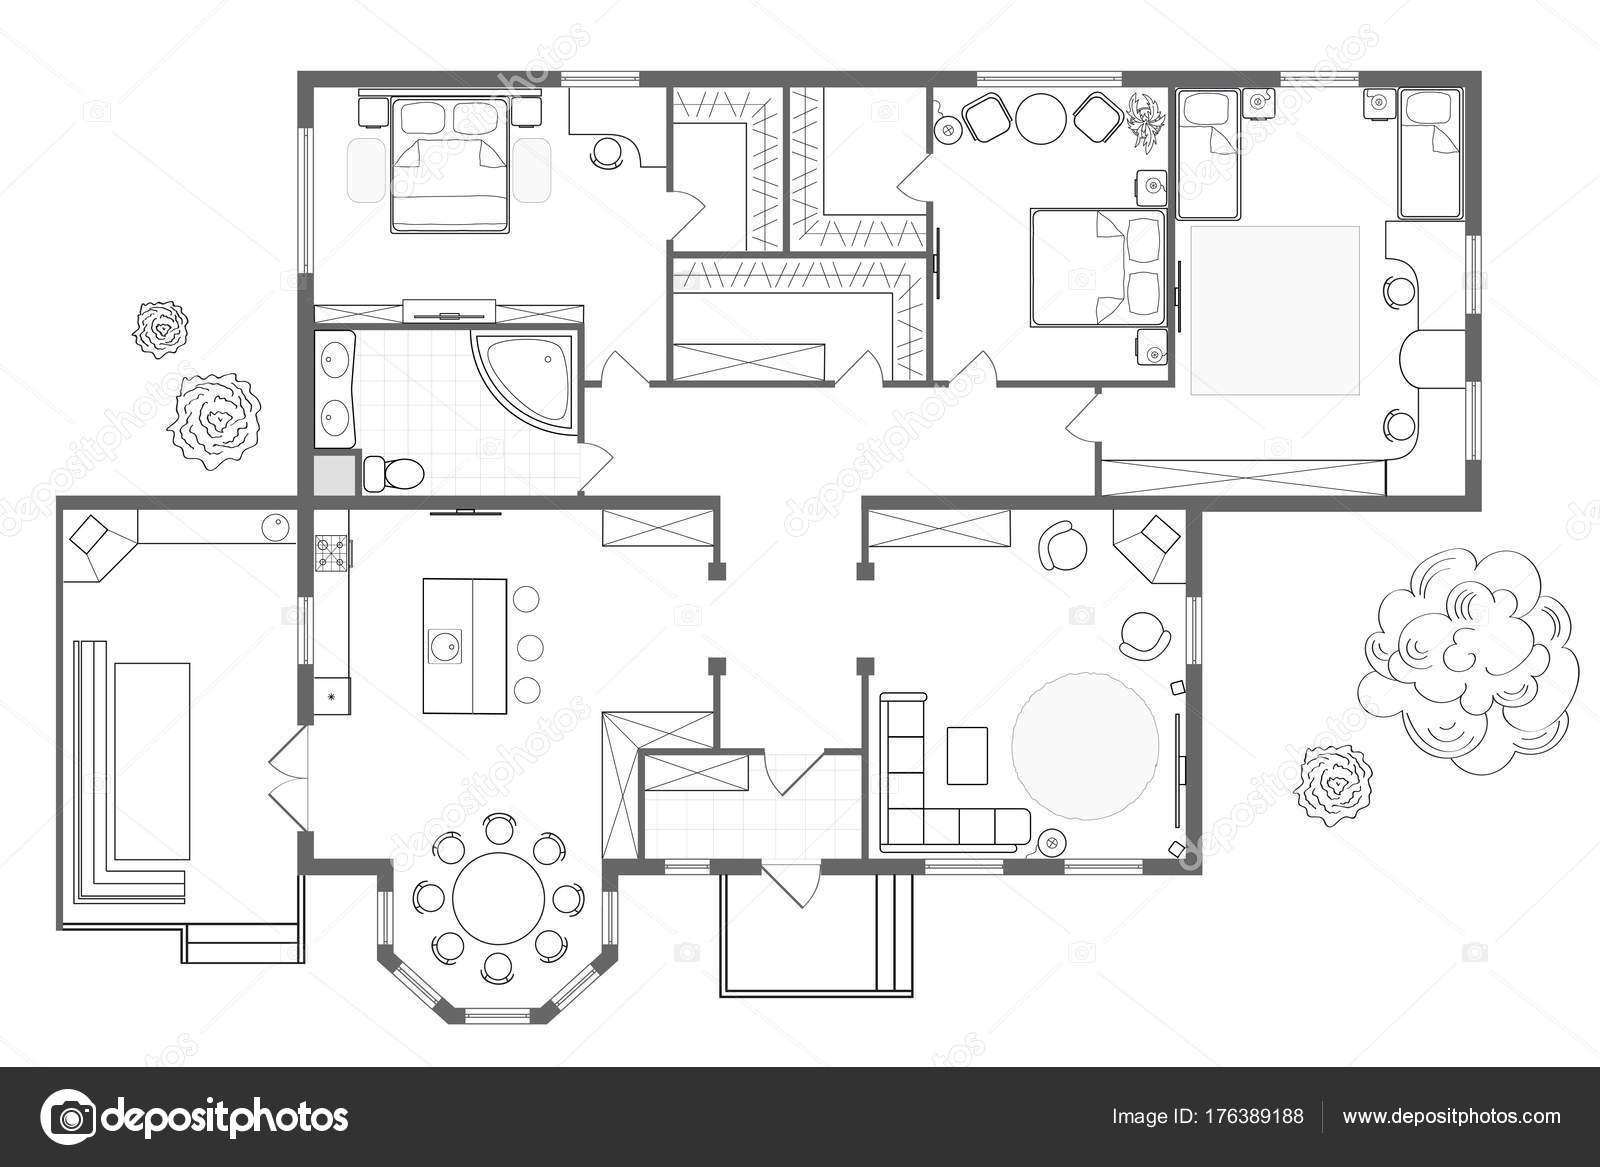 Plano arquitect nico de la casa dise o profesional con for Plano de una cocina profesional